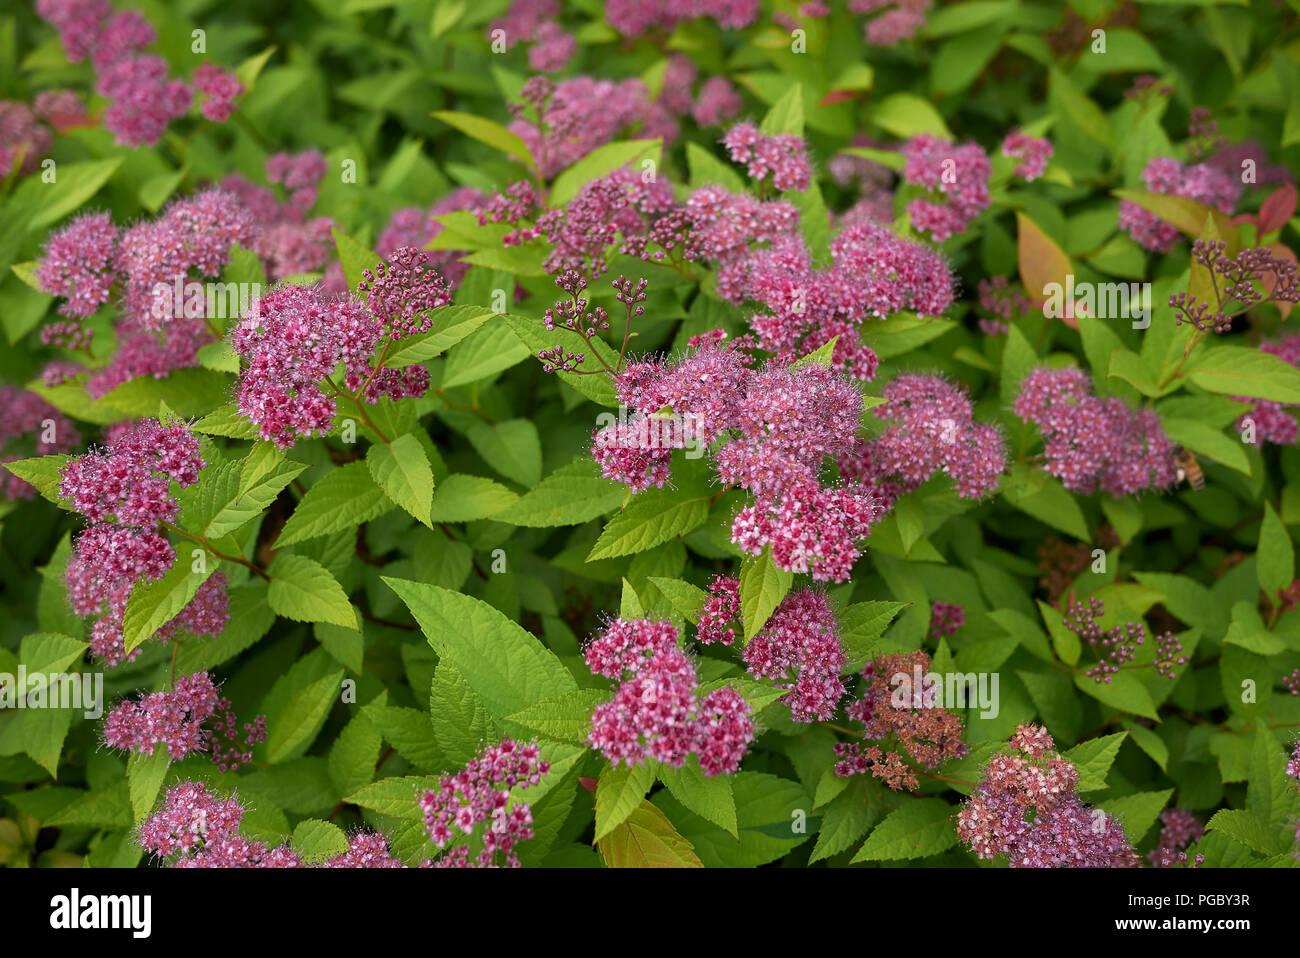 Spiraea Bumalda Stock Photo 216621659 Alamy